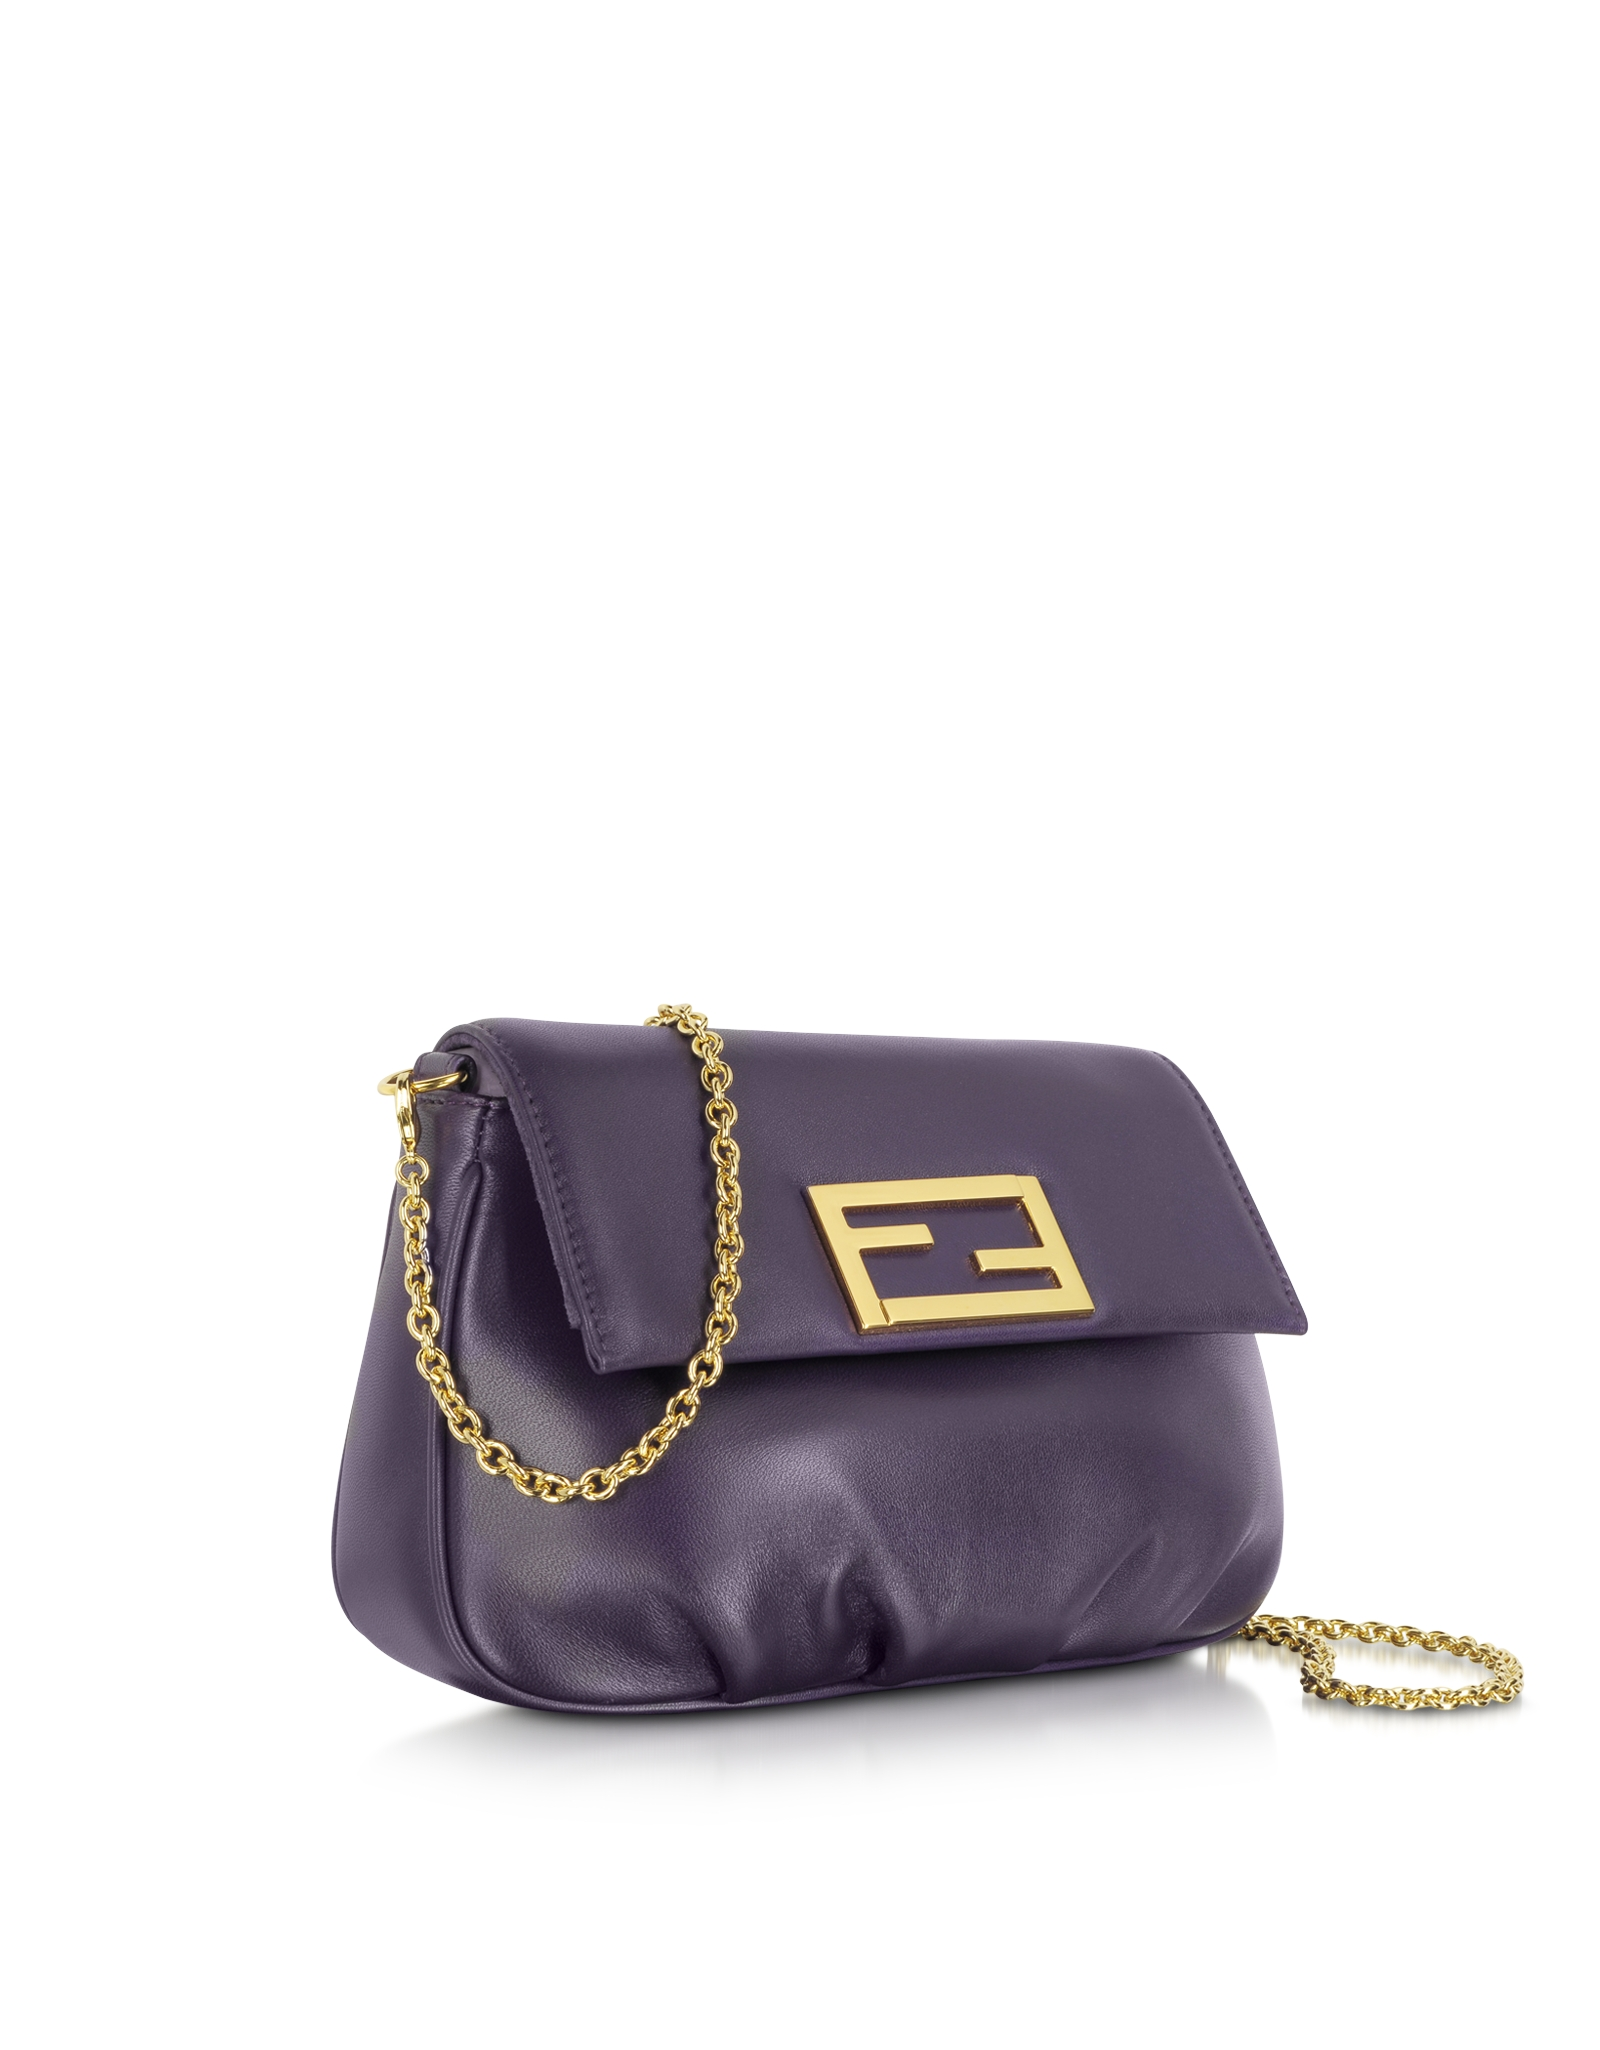 ... real lyst fendi mini pouch the sta crossbody bag in black f0295 868a7 b0f6b53946939